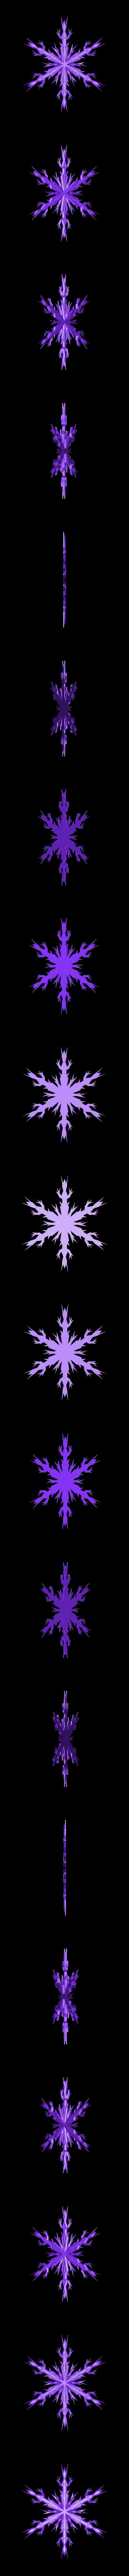 Snowflake_1.stl Download free STL file Snowflakes • 3D printable template, poblocki1982